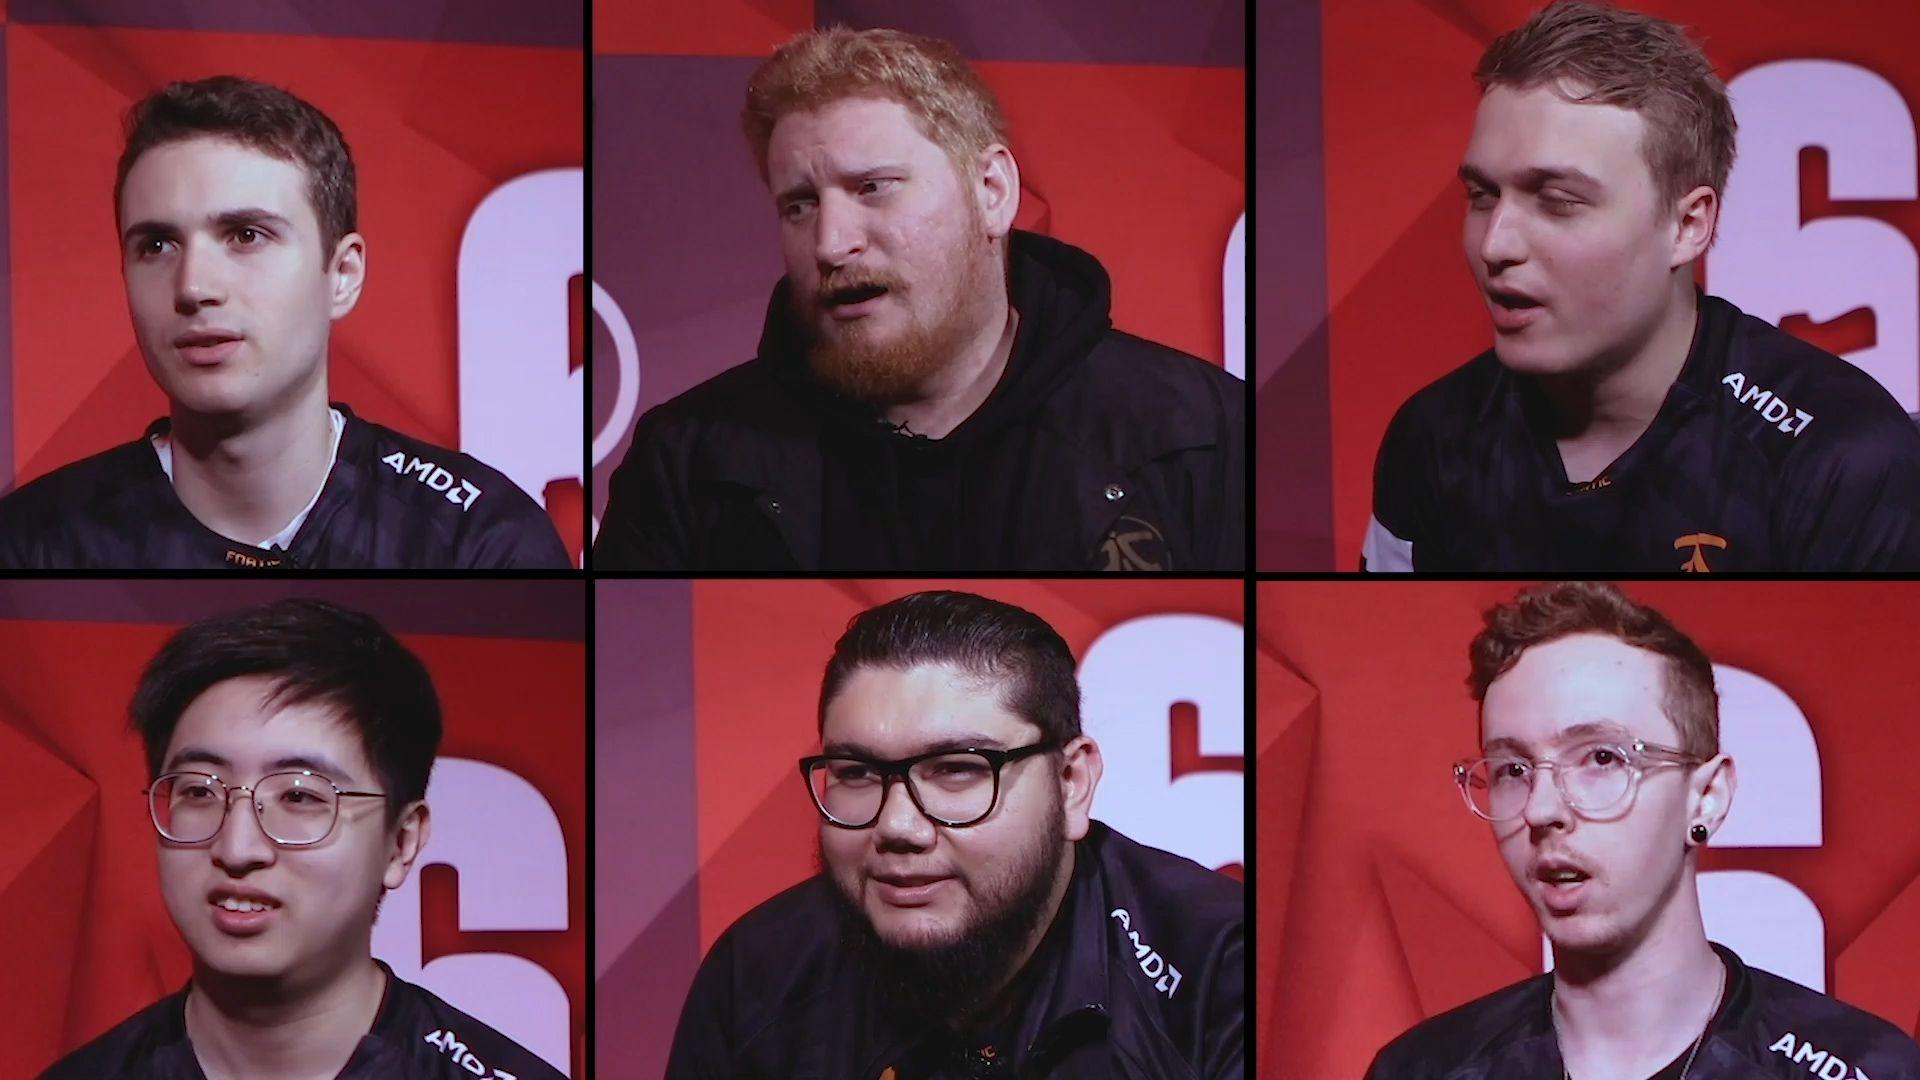 Rainbow Six Siege professional gamers team FNATIC